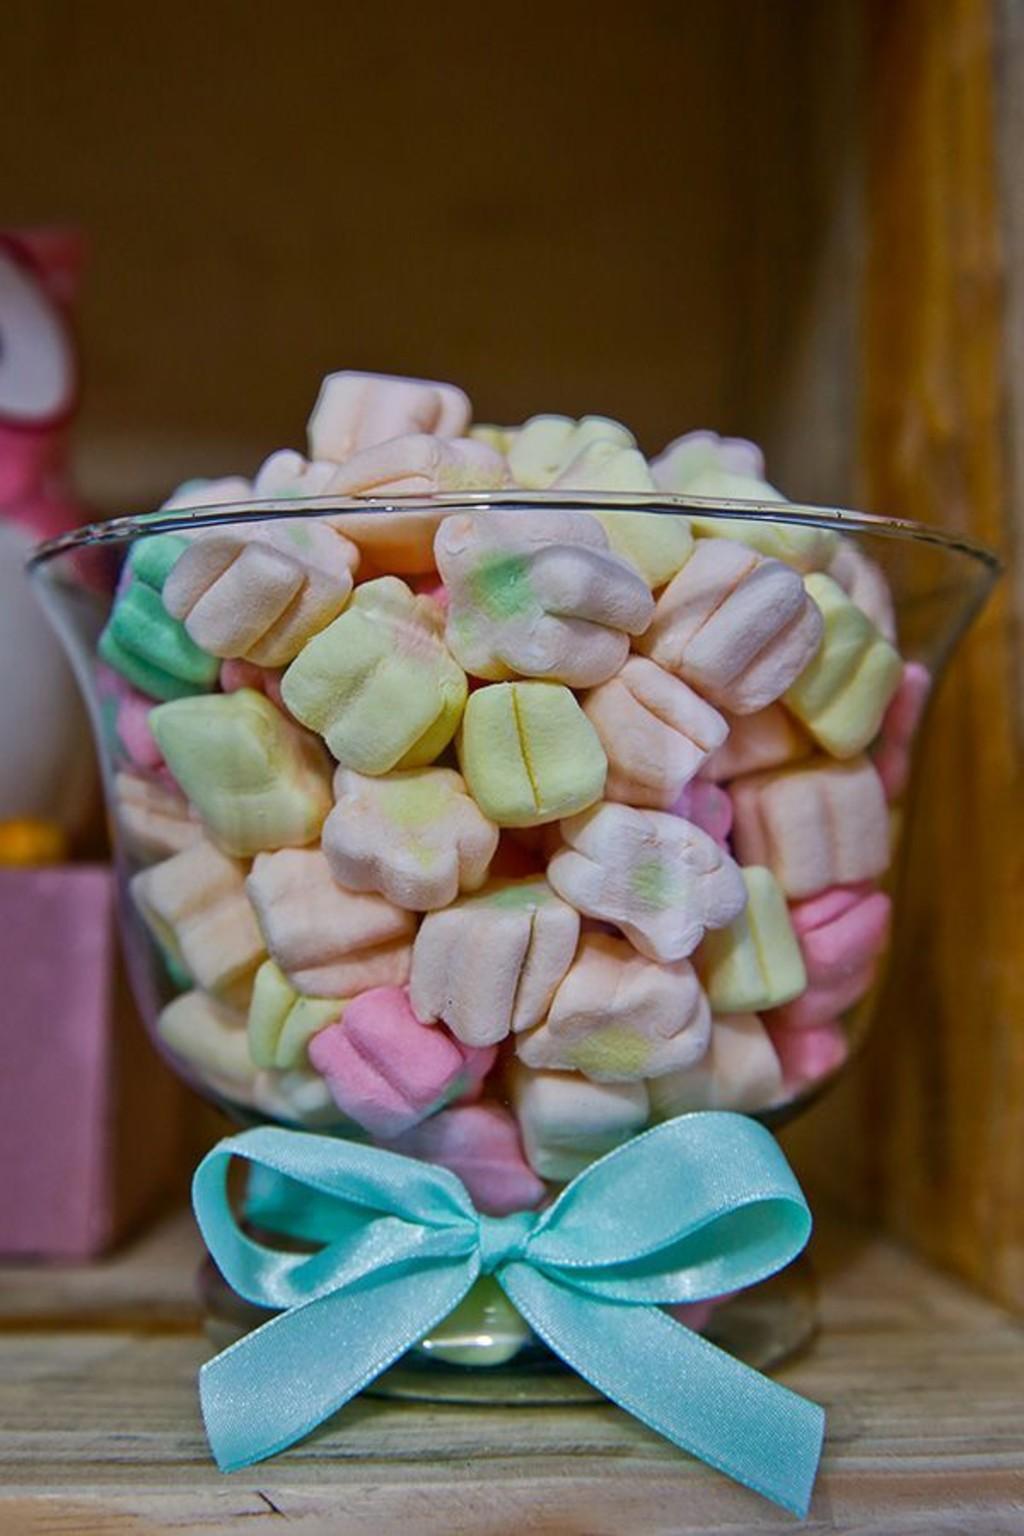 сладкий стол на праздник